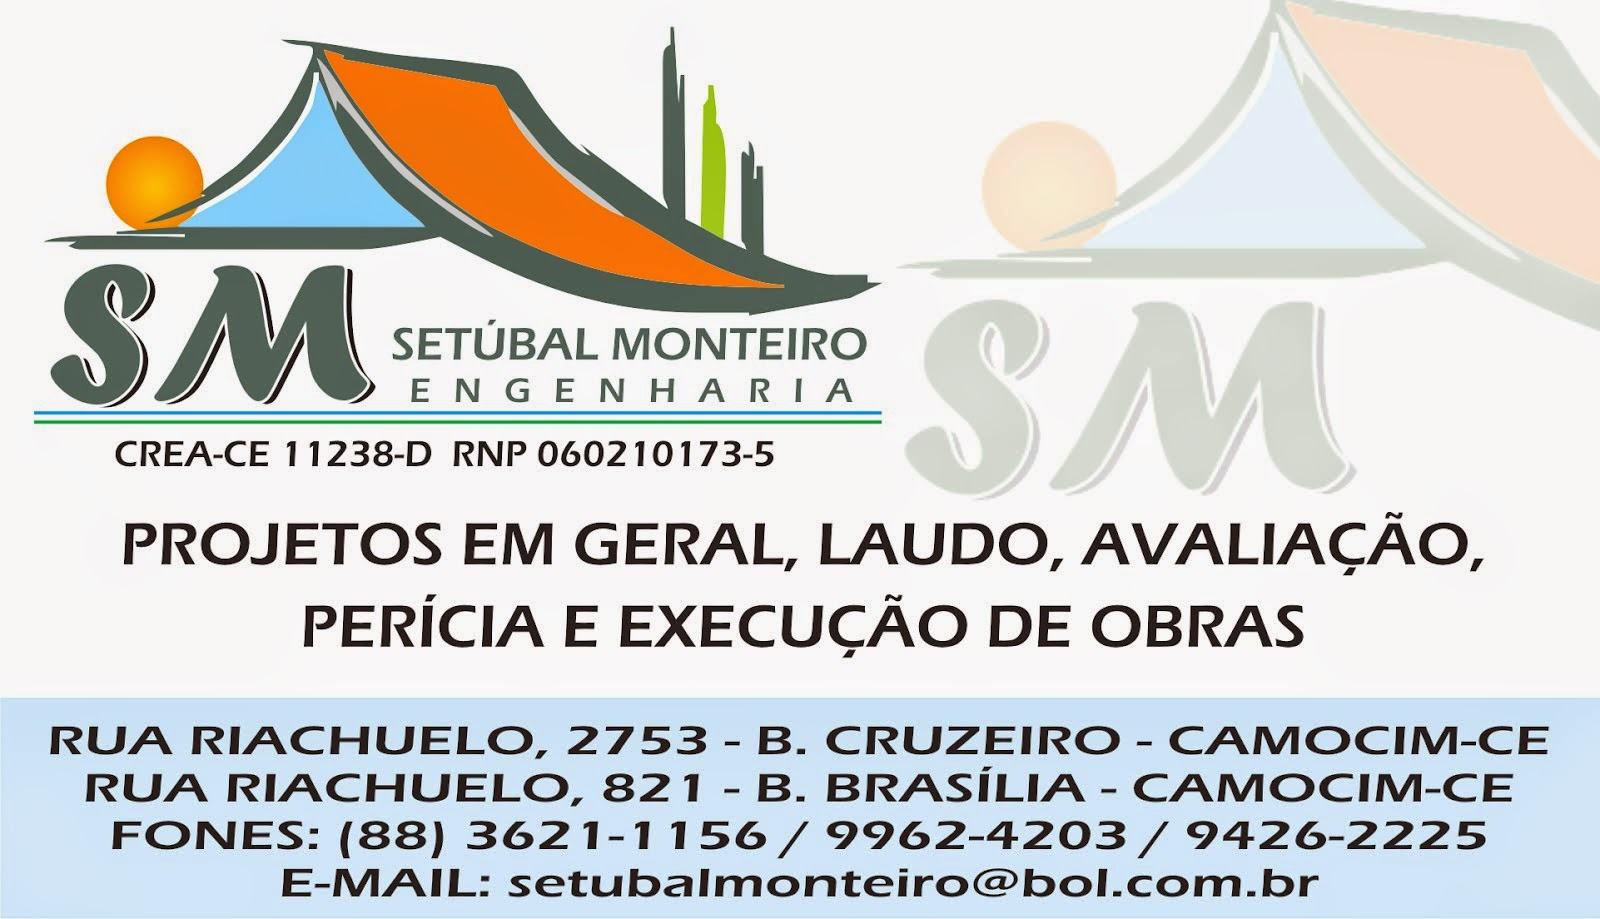 SETUBAL MONTEIRO - ENGENHARIA